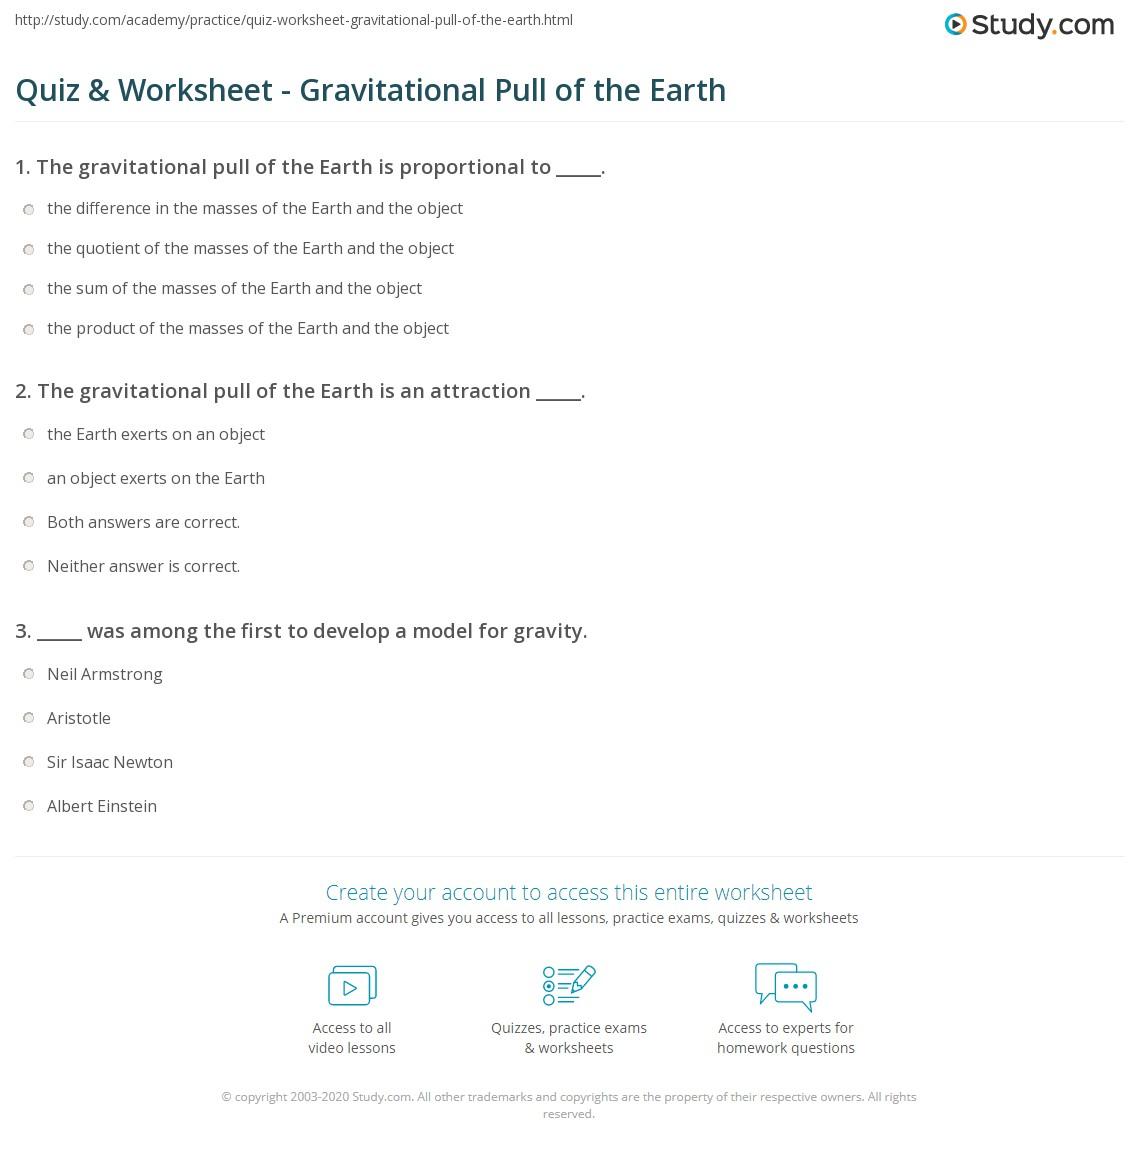 quiz worksheet gravitational pull of the earth. Black Bedroom Furniture Sets. Home Design Ideas